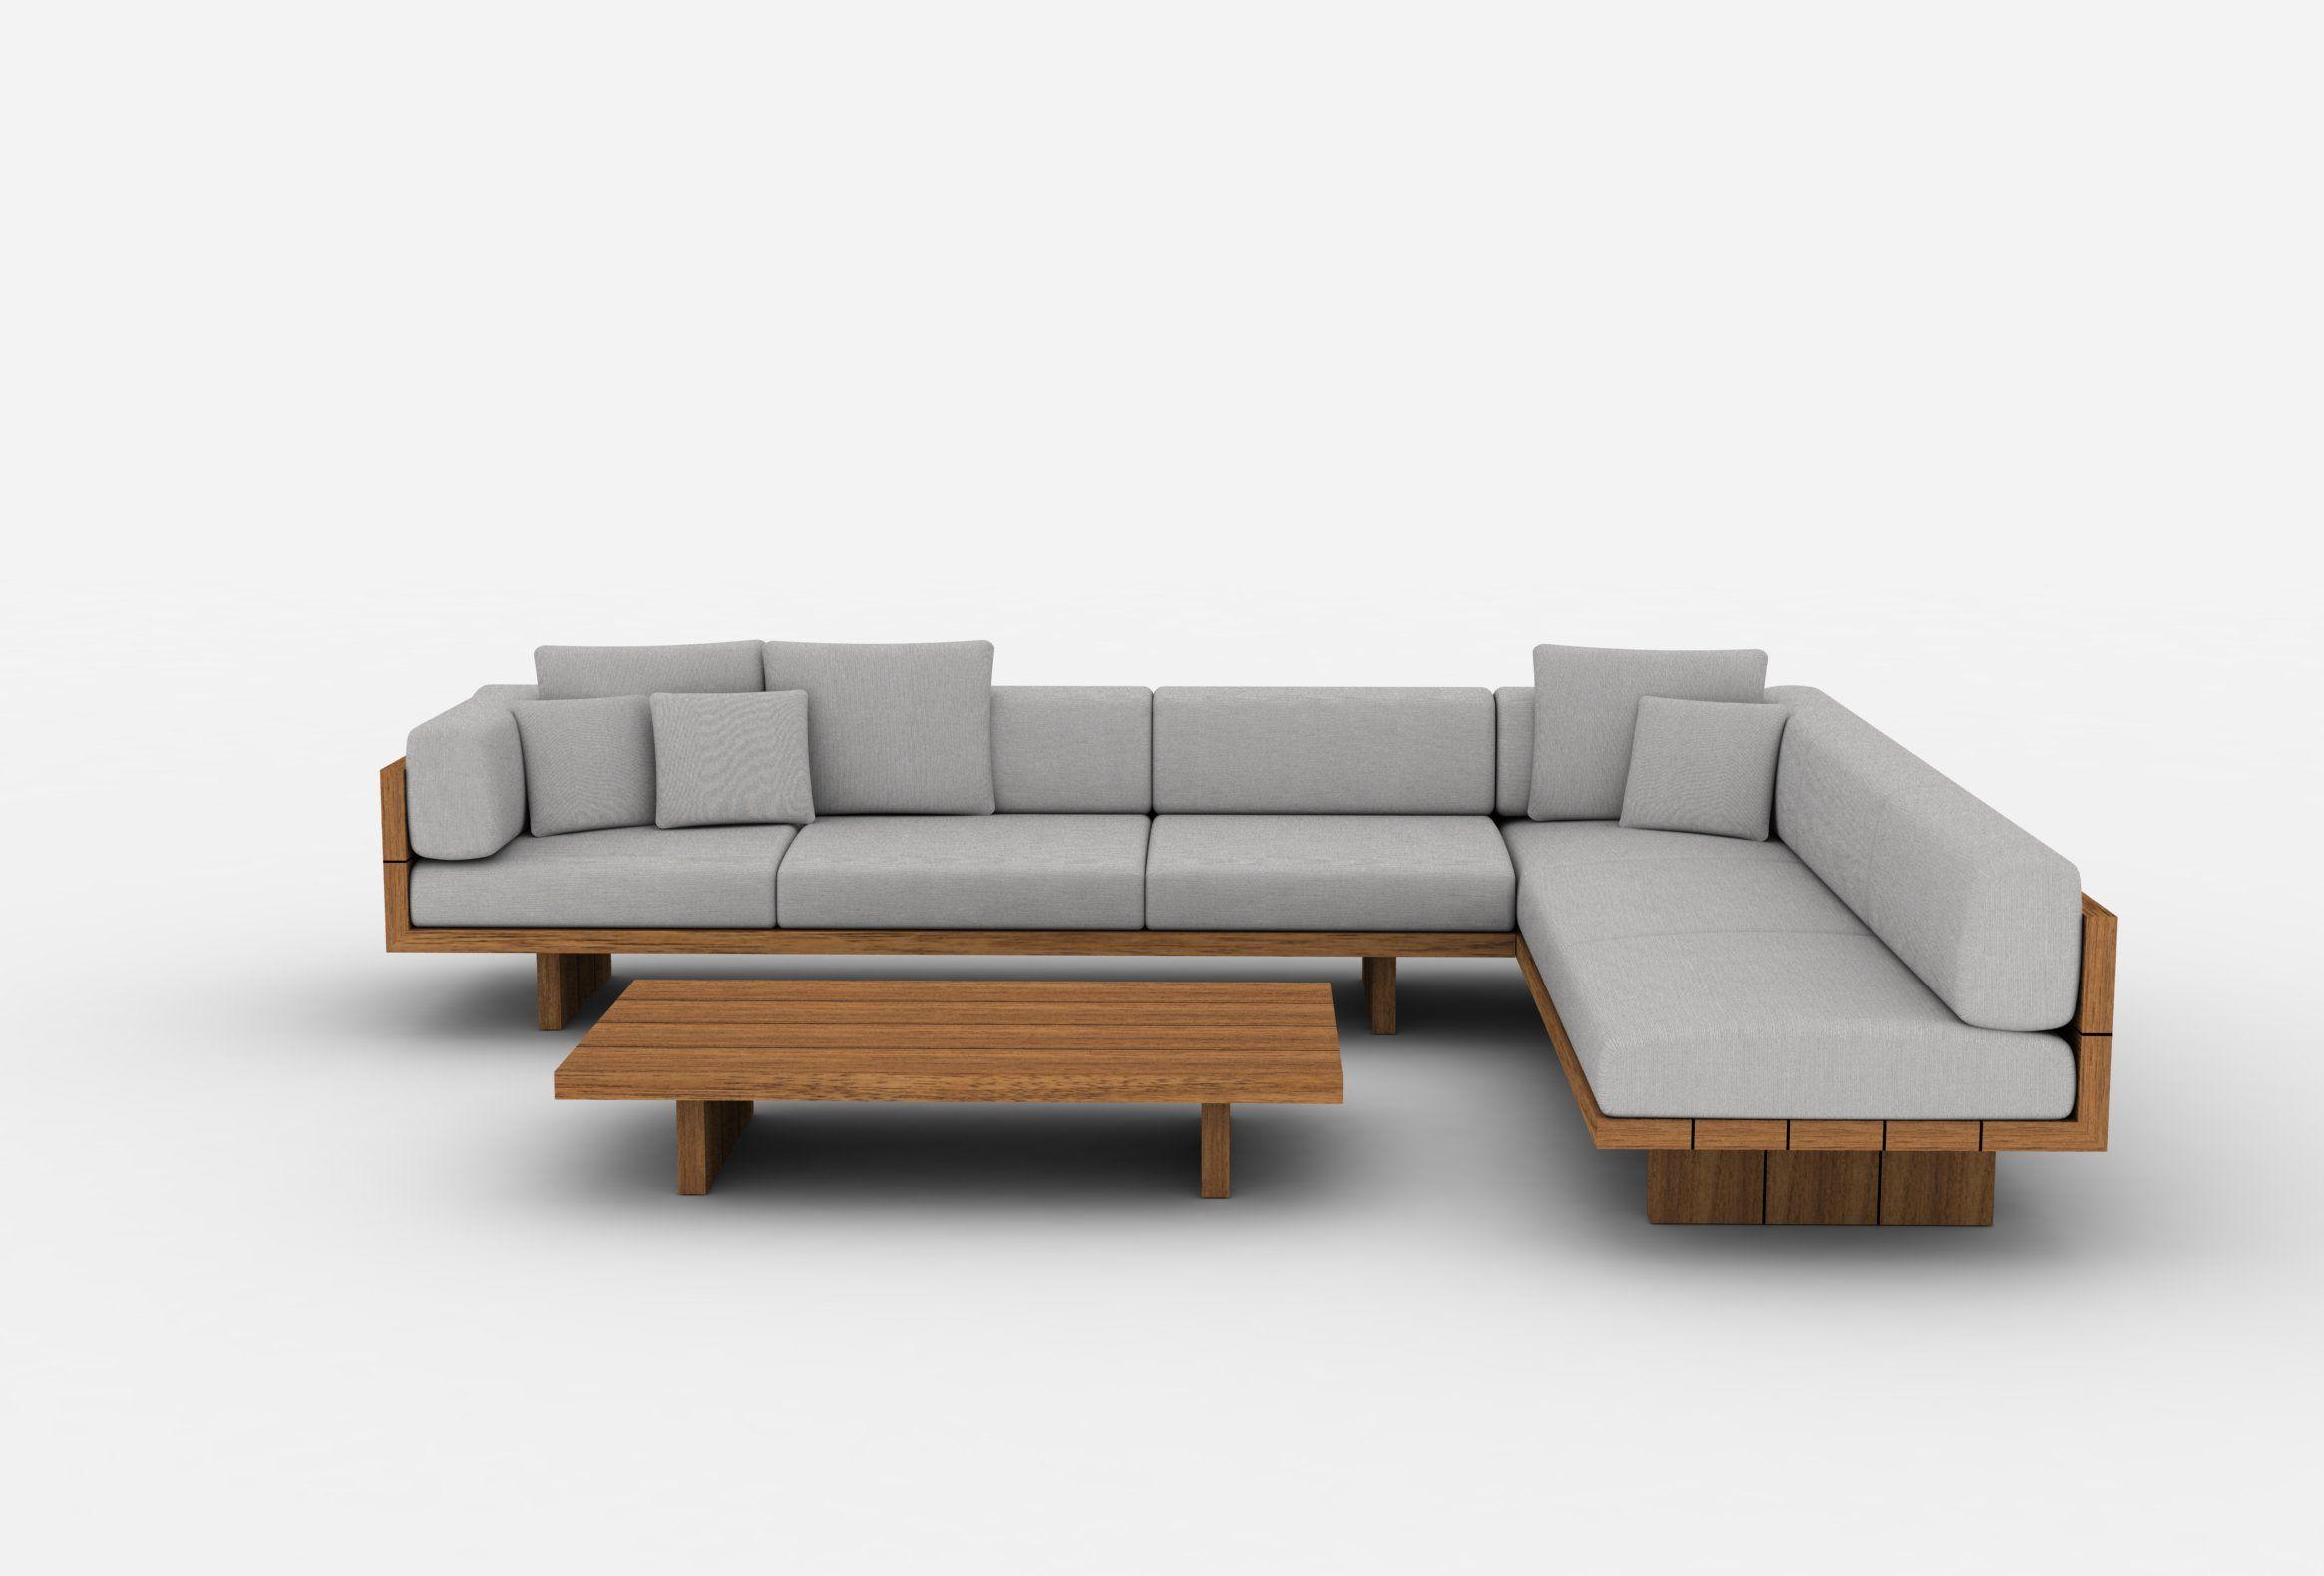 Timber Sofa Wooden Sofa Designs Sofa Design Furniture